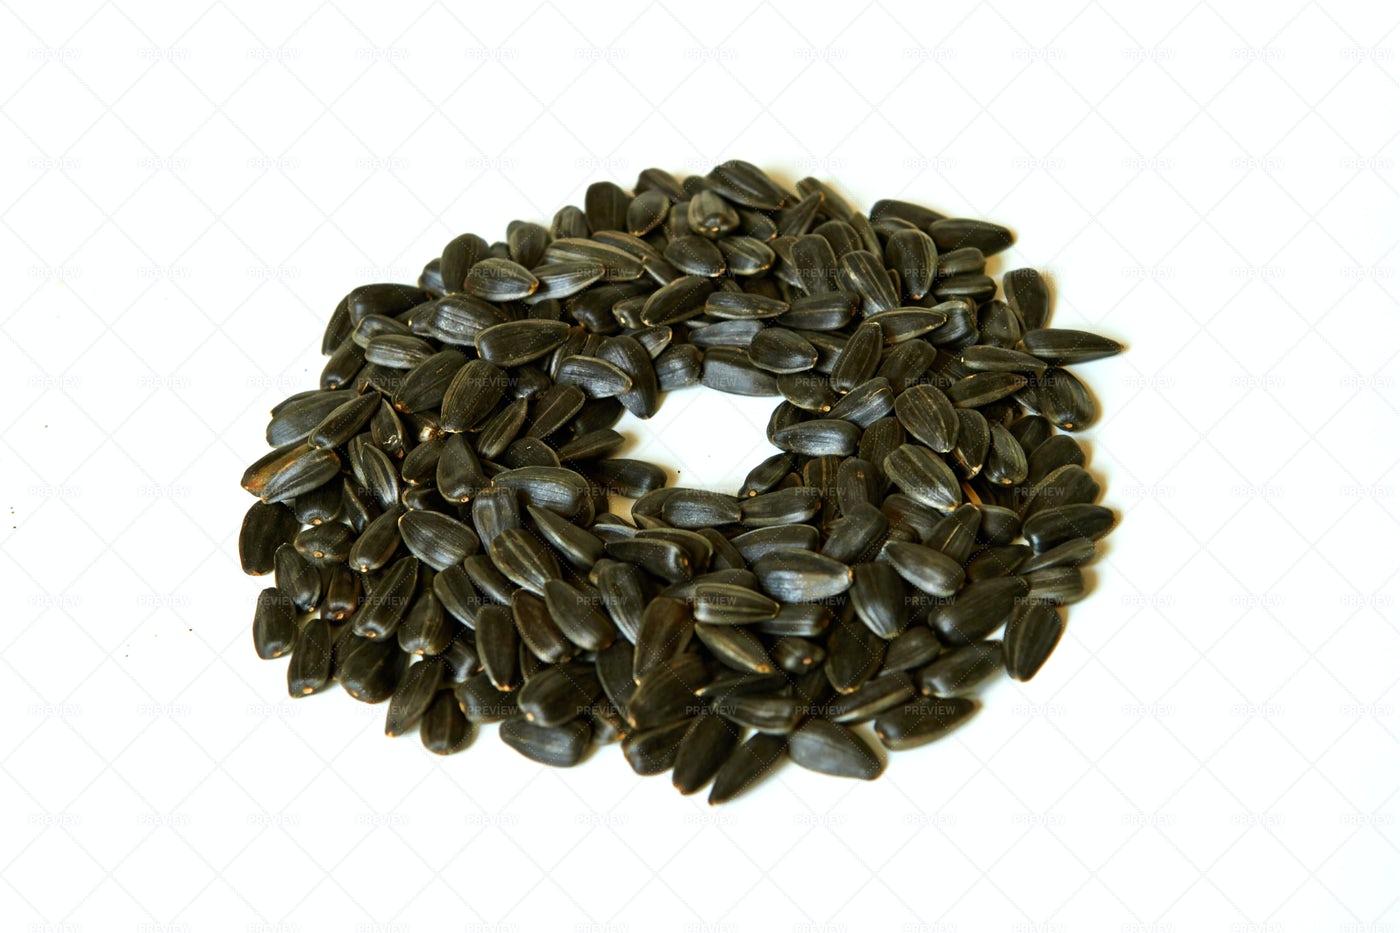 Sunflower Seeds: Stock Photos